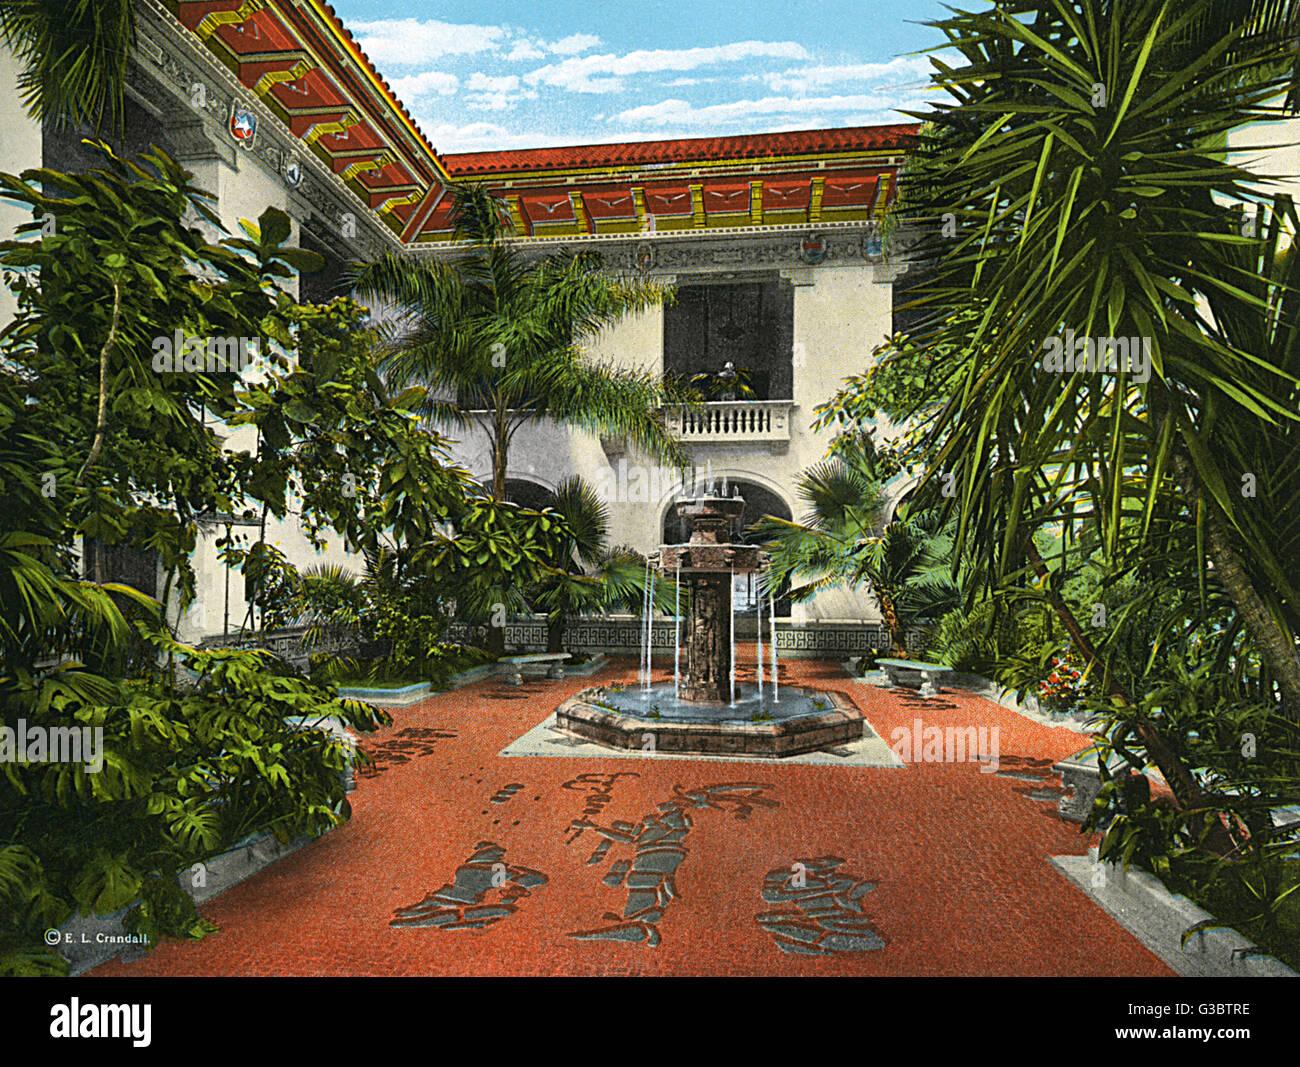 Washington DC, USA   Patio And Aztec Fountain   Pan American Union Building  Date: 1920